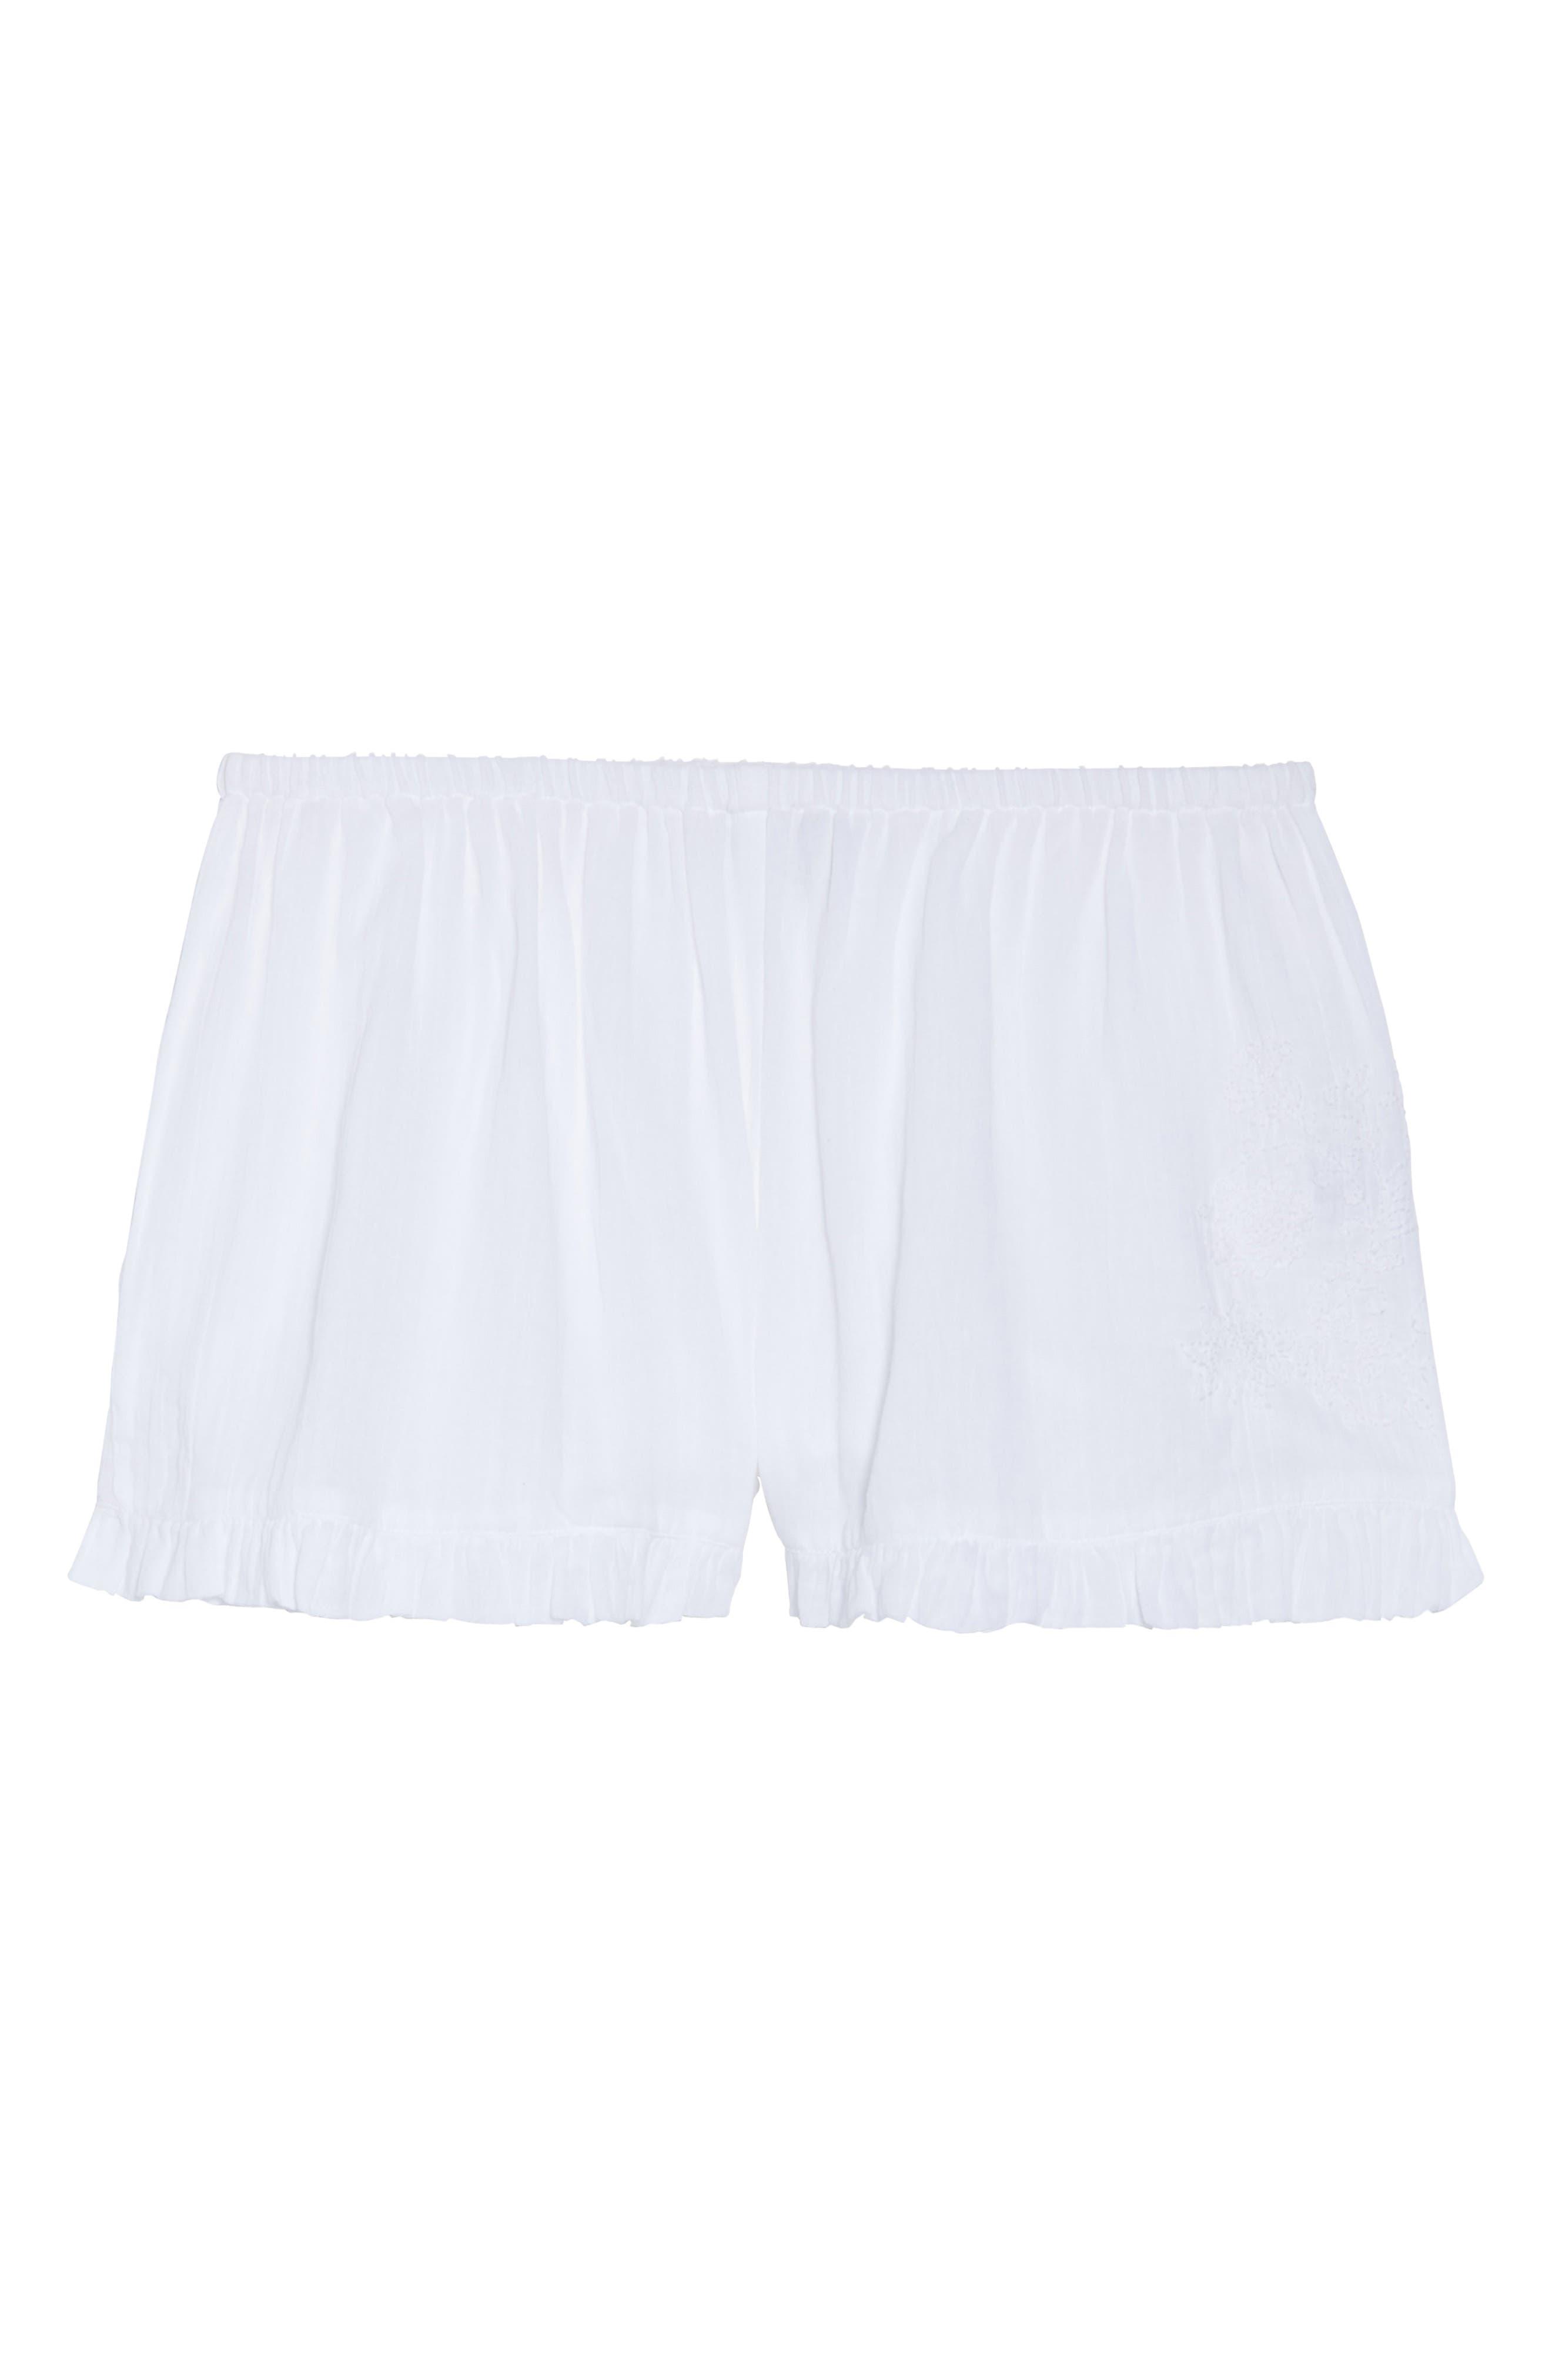 Cambria Ruffle Sleep Shorts,                             Alternate thumbnail 6, color,                             105